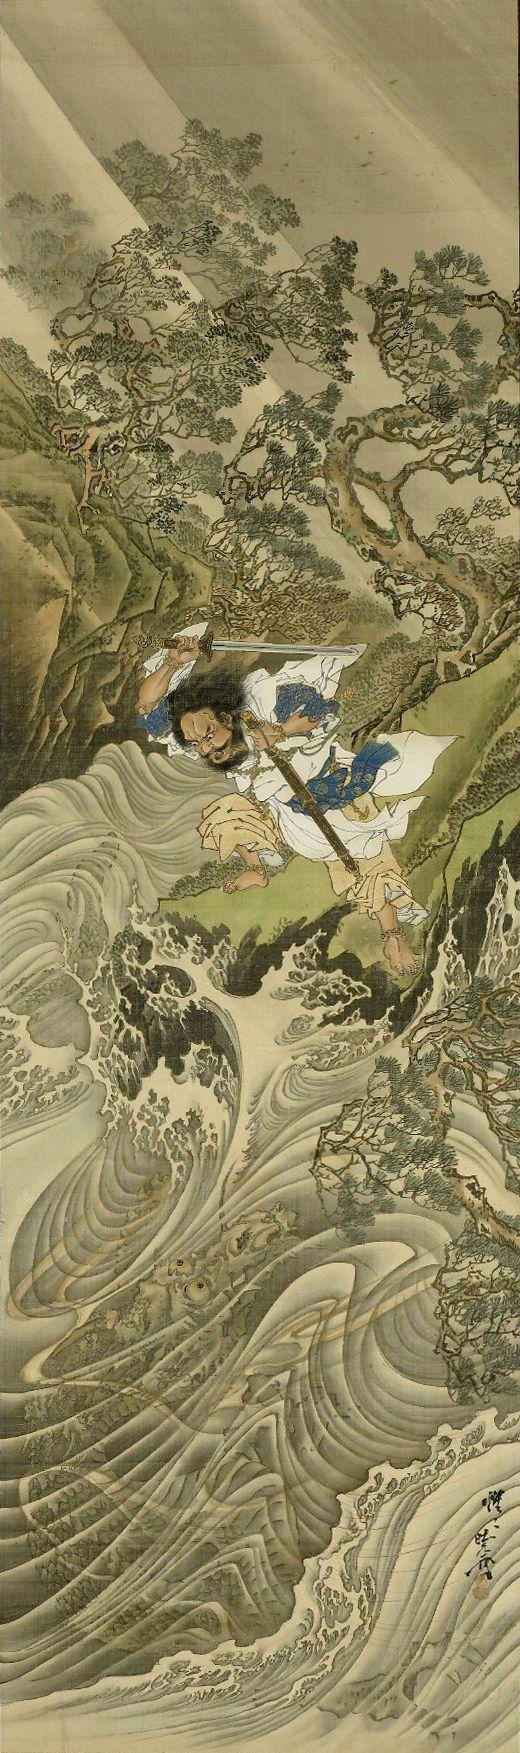 Susano'o no Mikoto subduing the eight-headed serpent, ca. 1887 by Kawanabe Kyosai